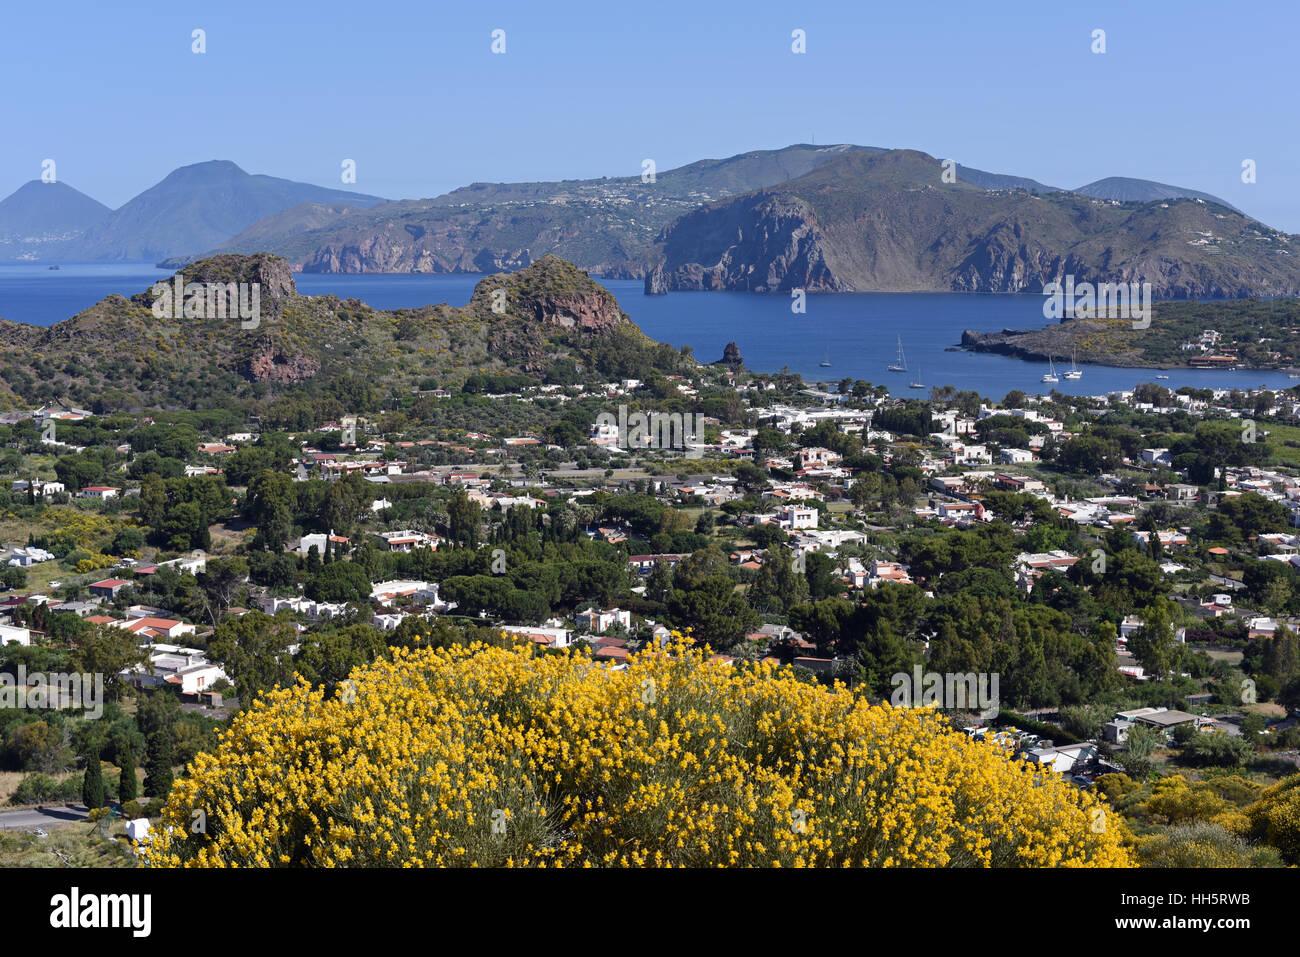 View of Lipari and Salina from the climb up Vulcano Island Stock Photo